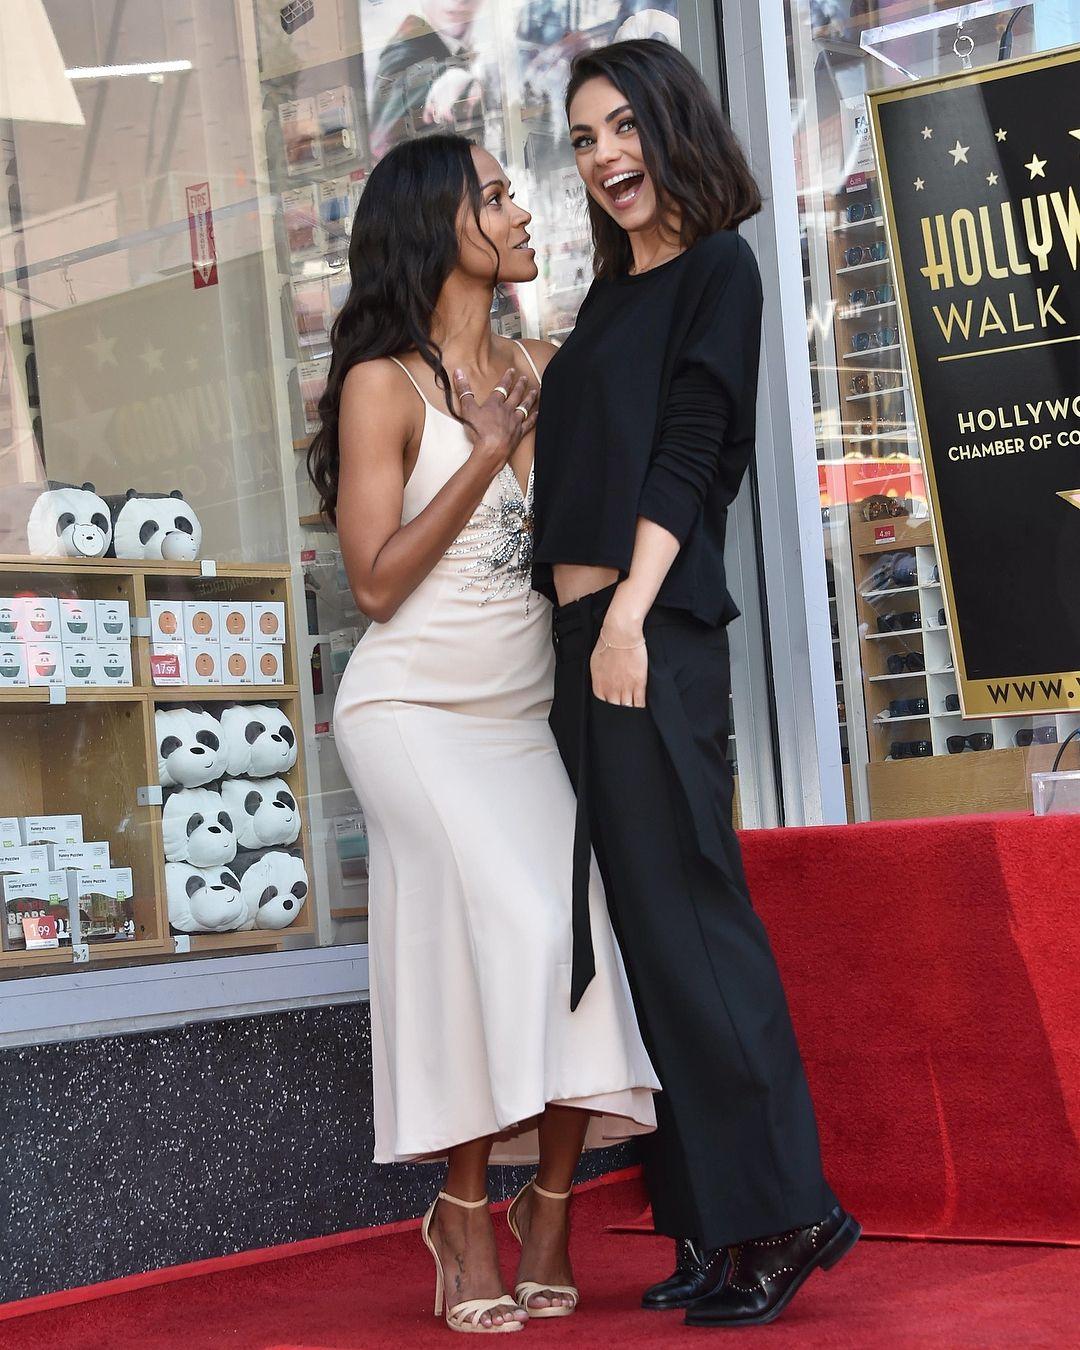 cd8754d50d476 This friendship ❤ #MilaKunis #zoesaldana | Mila Kunis in 2019 ...